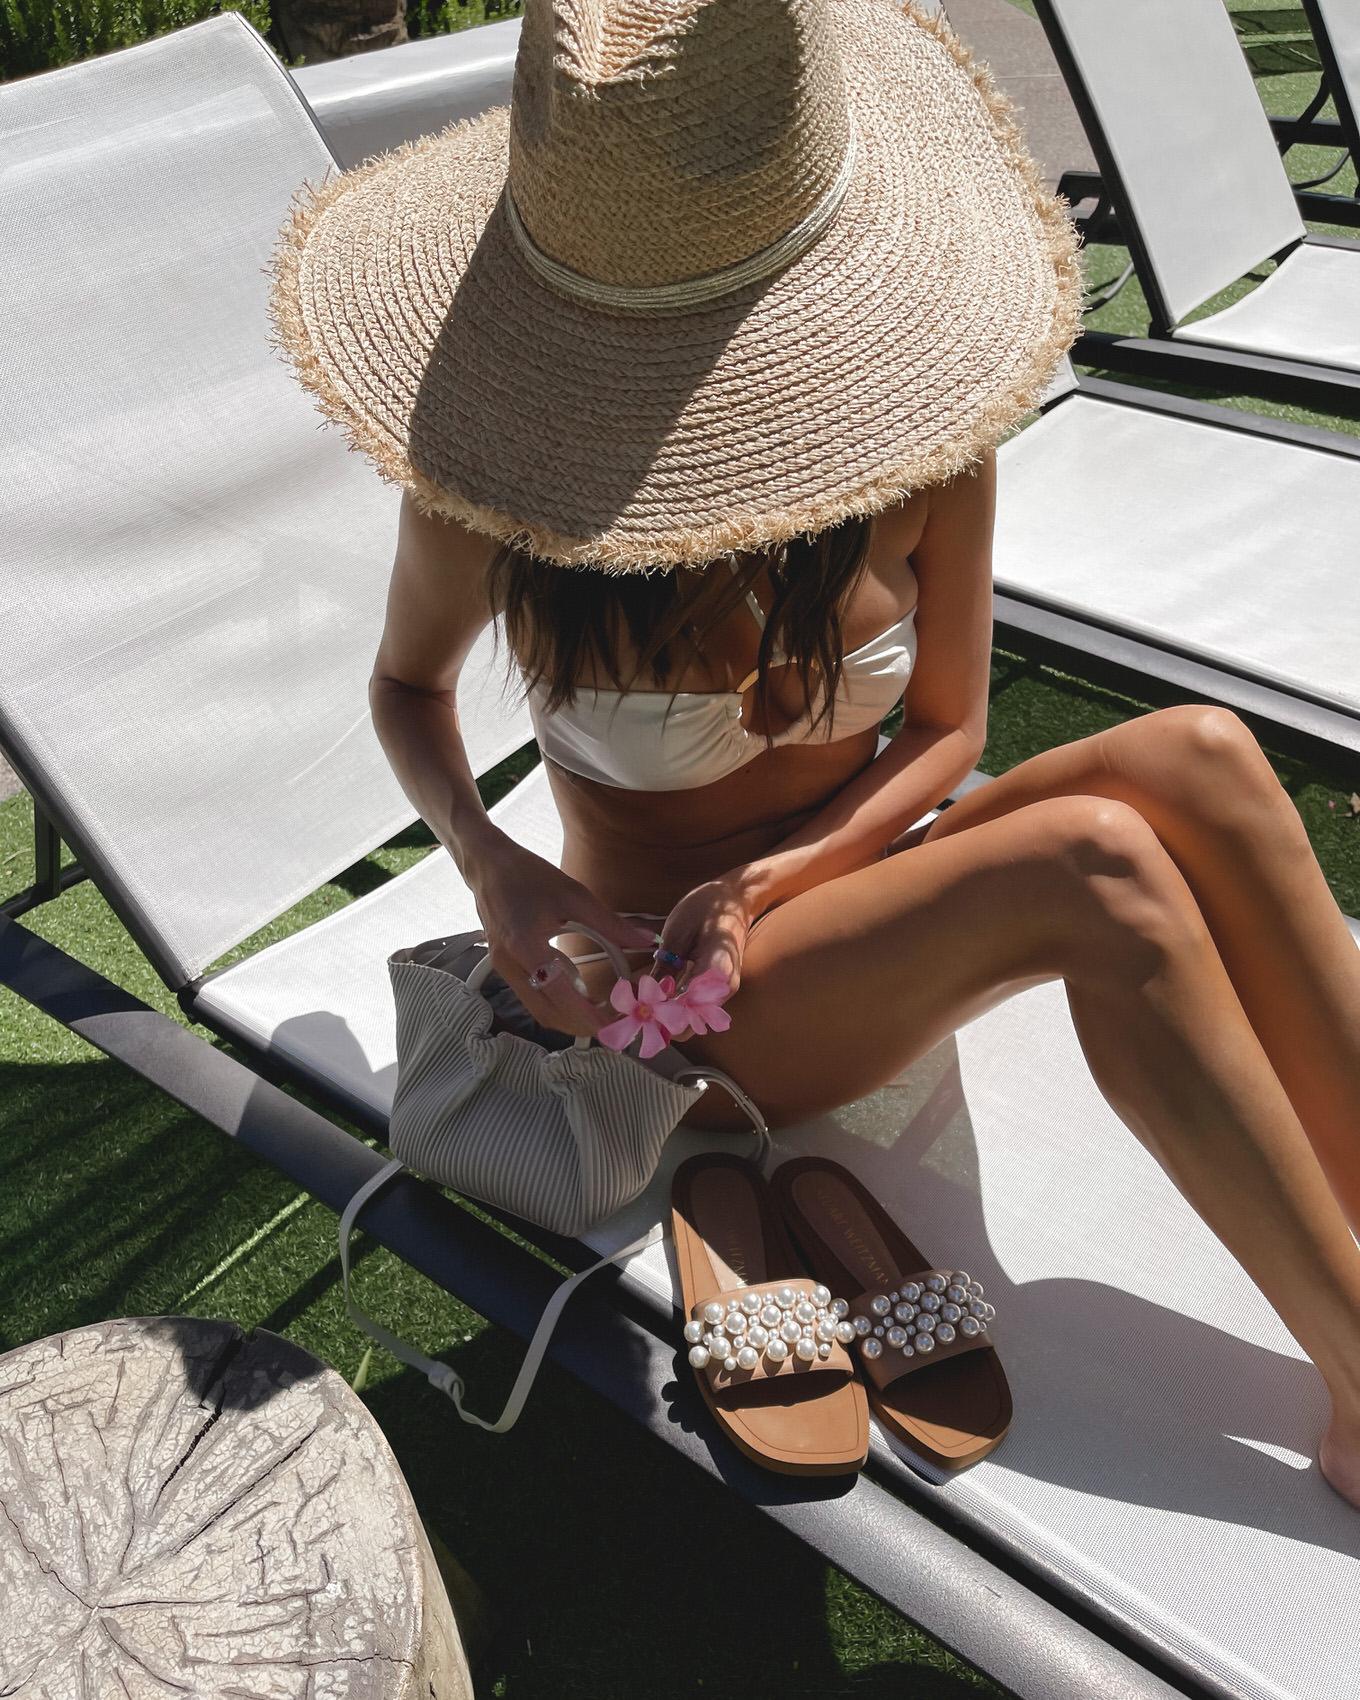 carry-on summer getaway essentials